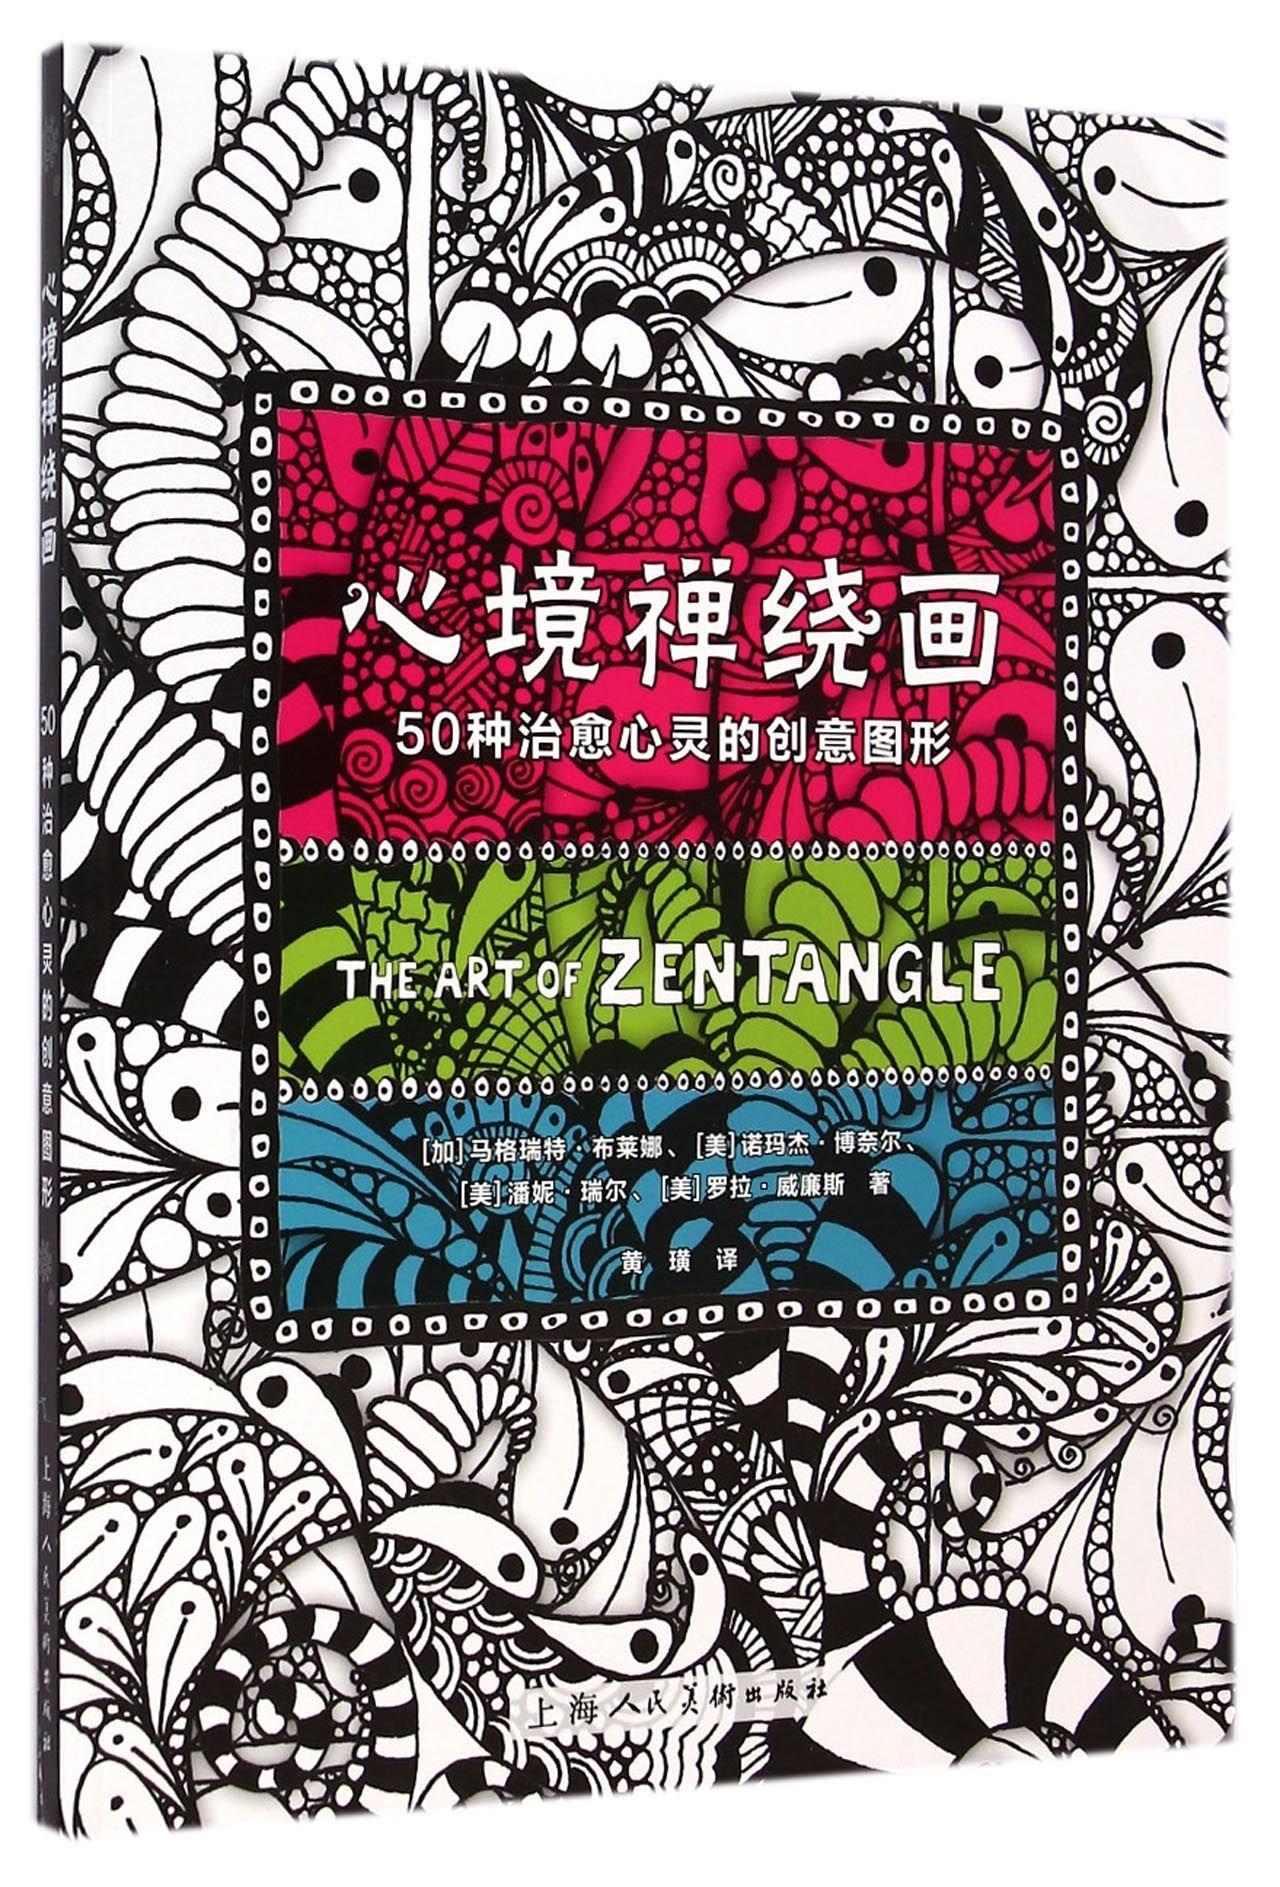 The Art of Zentangle (Chinese Edition) pdf epub